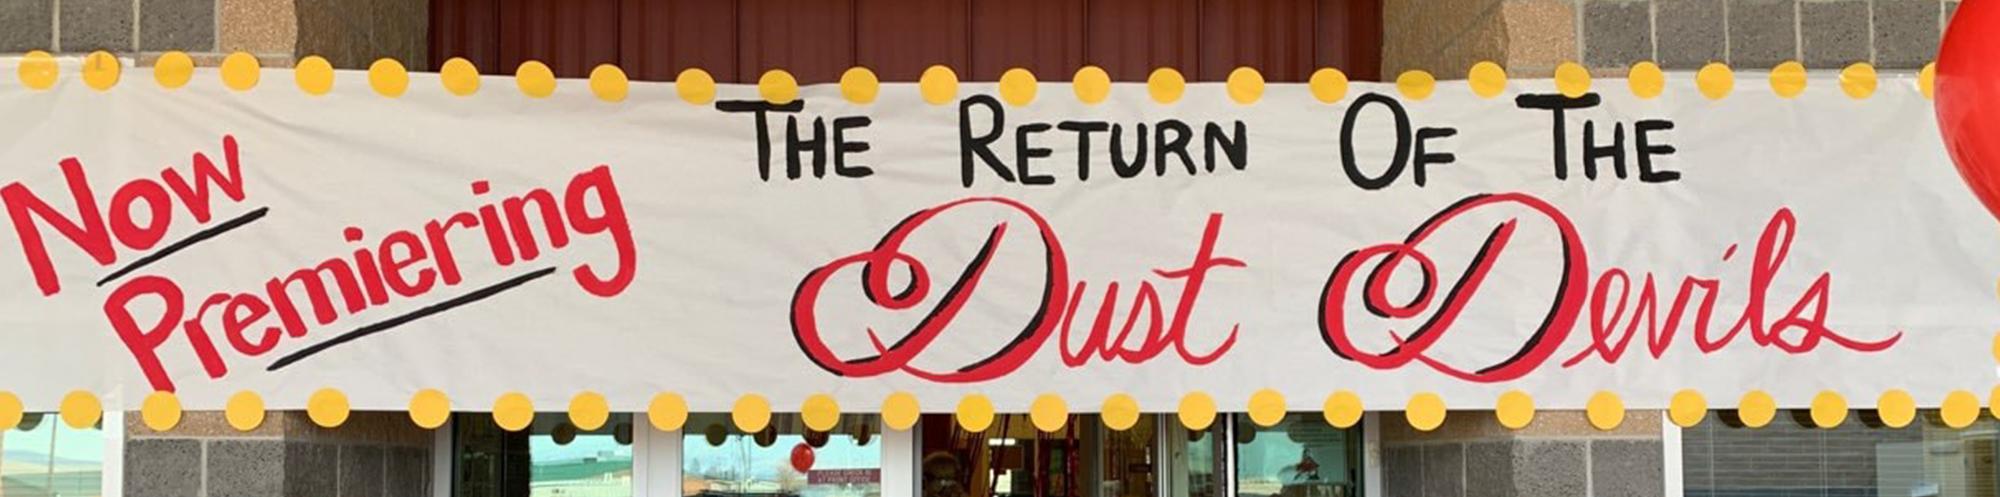 Now Premeiring the return of the dust devils